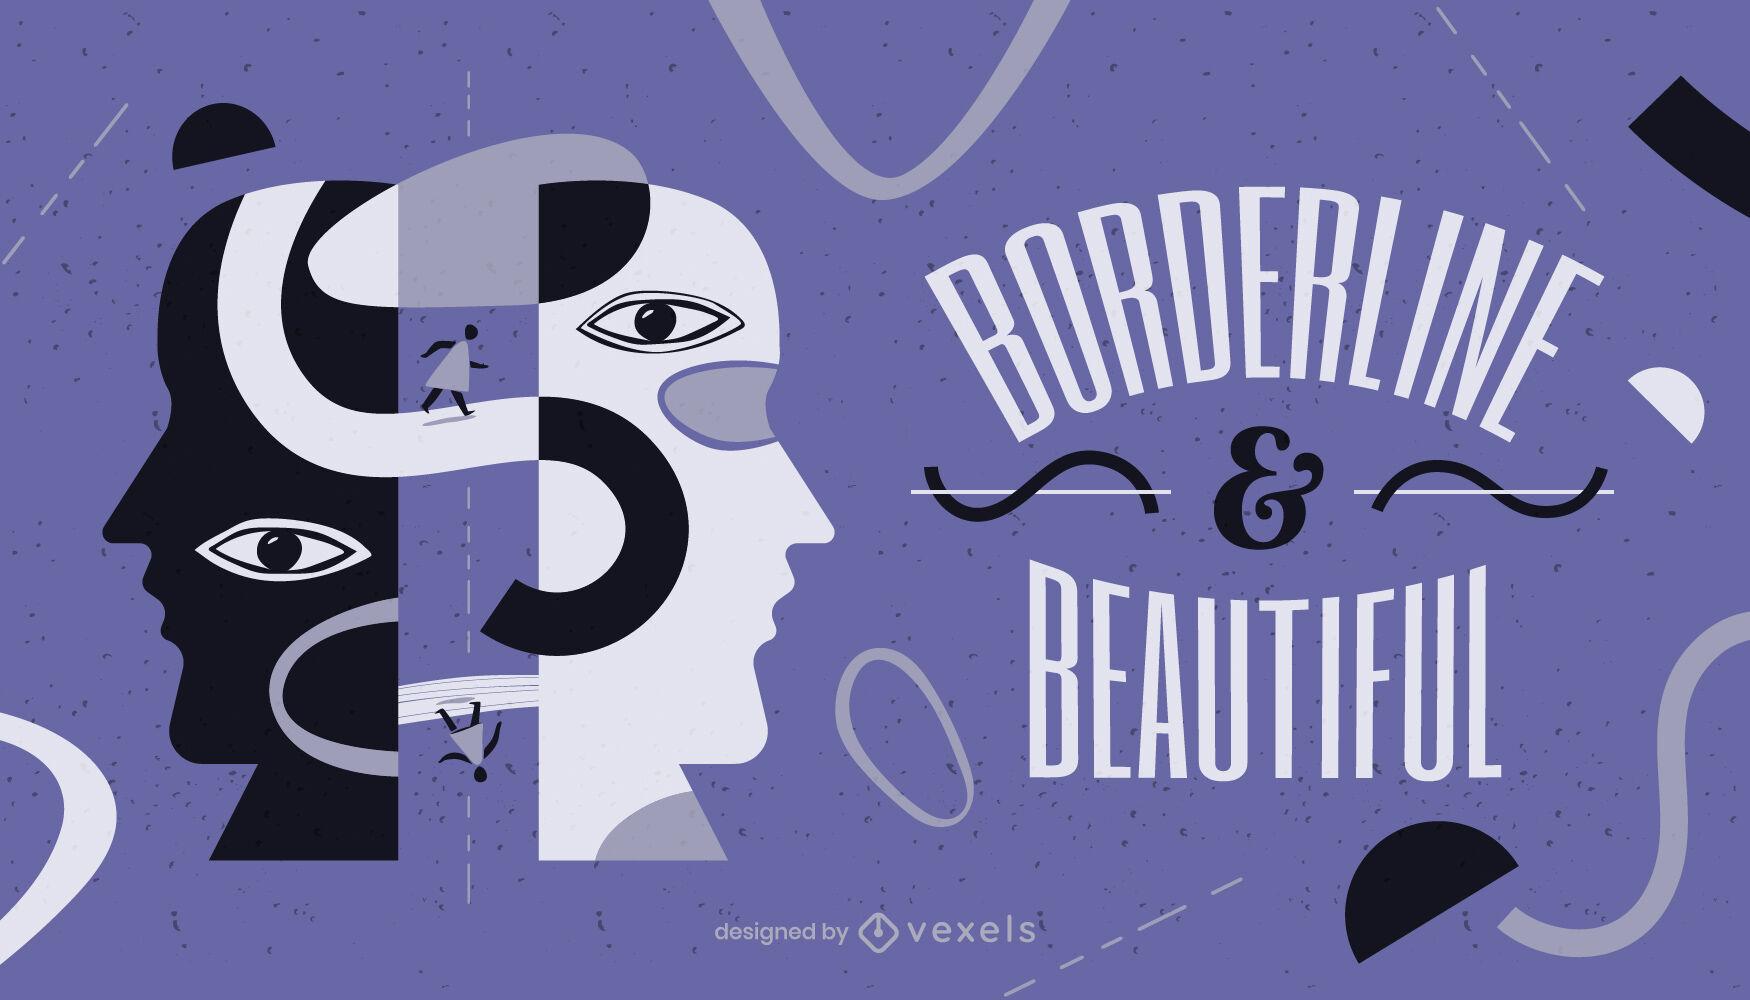 Borderline quote illustration design